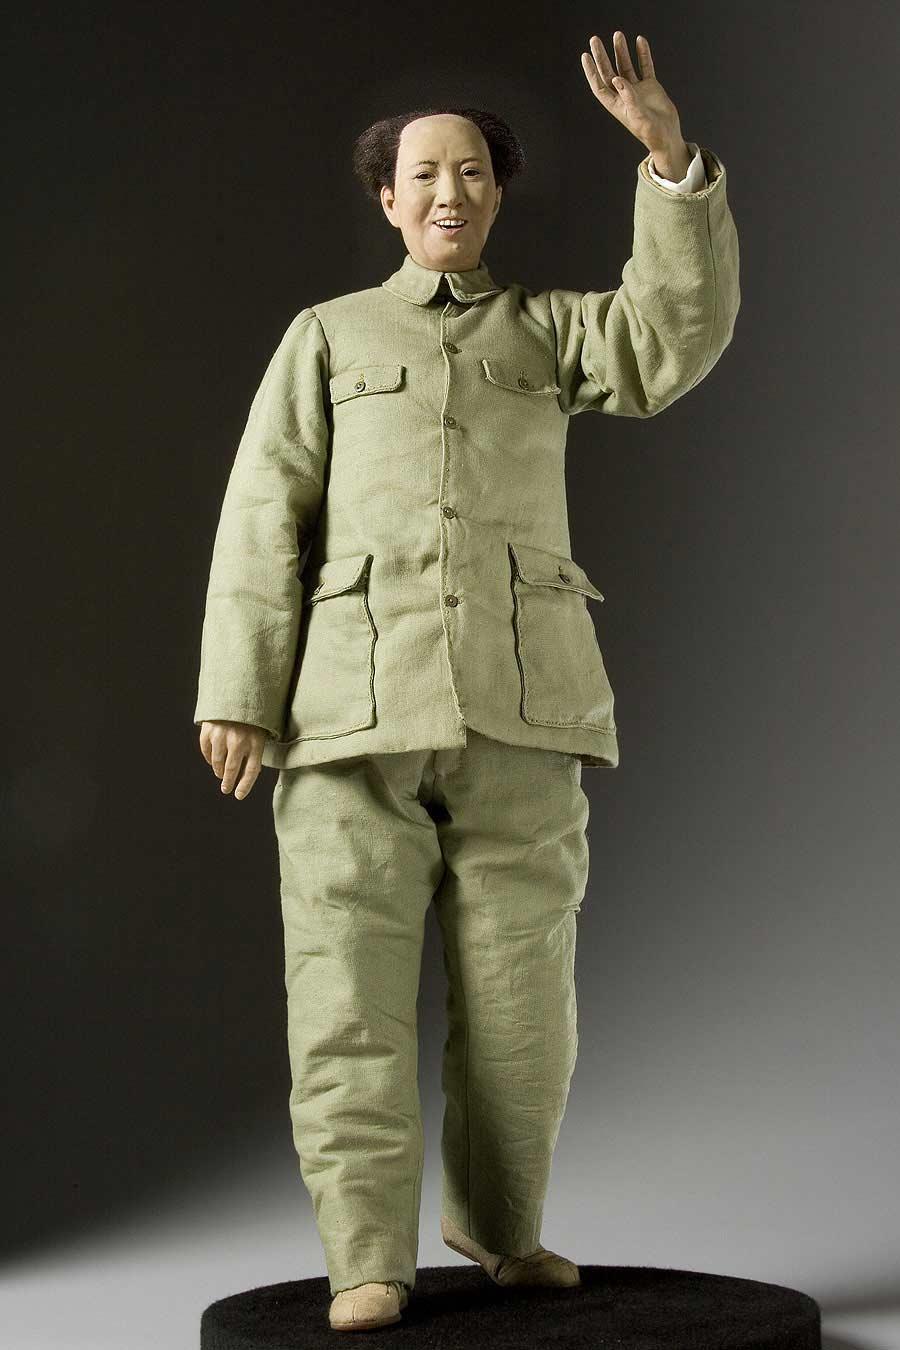 Full length color image of Mao Tse-Tung aka. Mao Zedong, Chairman Mao, by George Stuart.